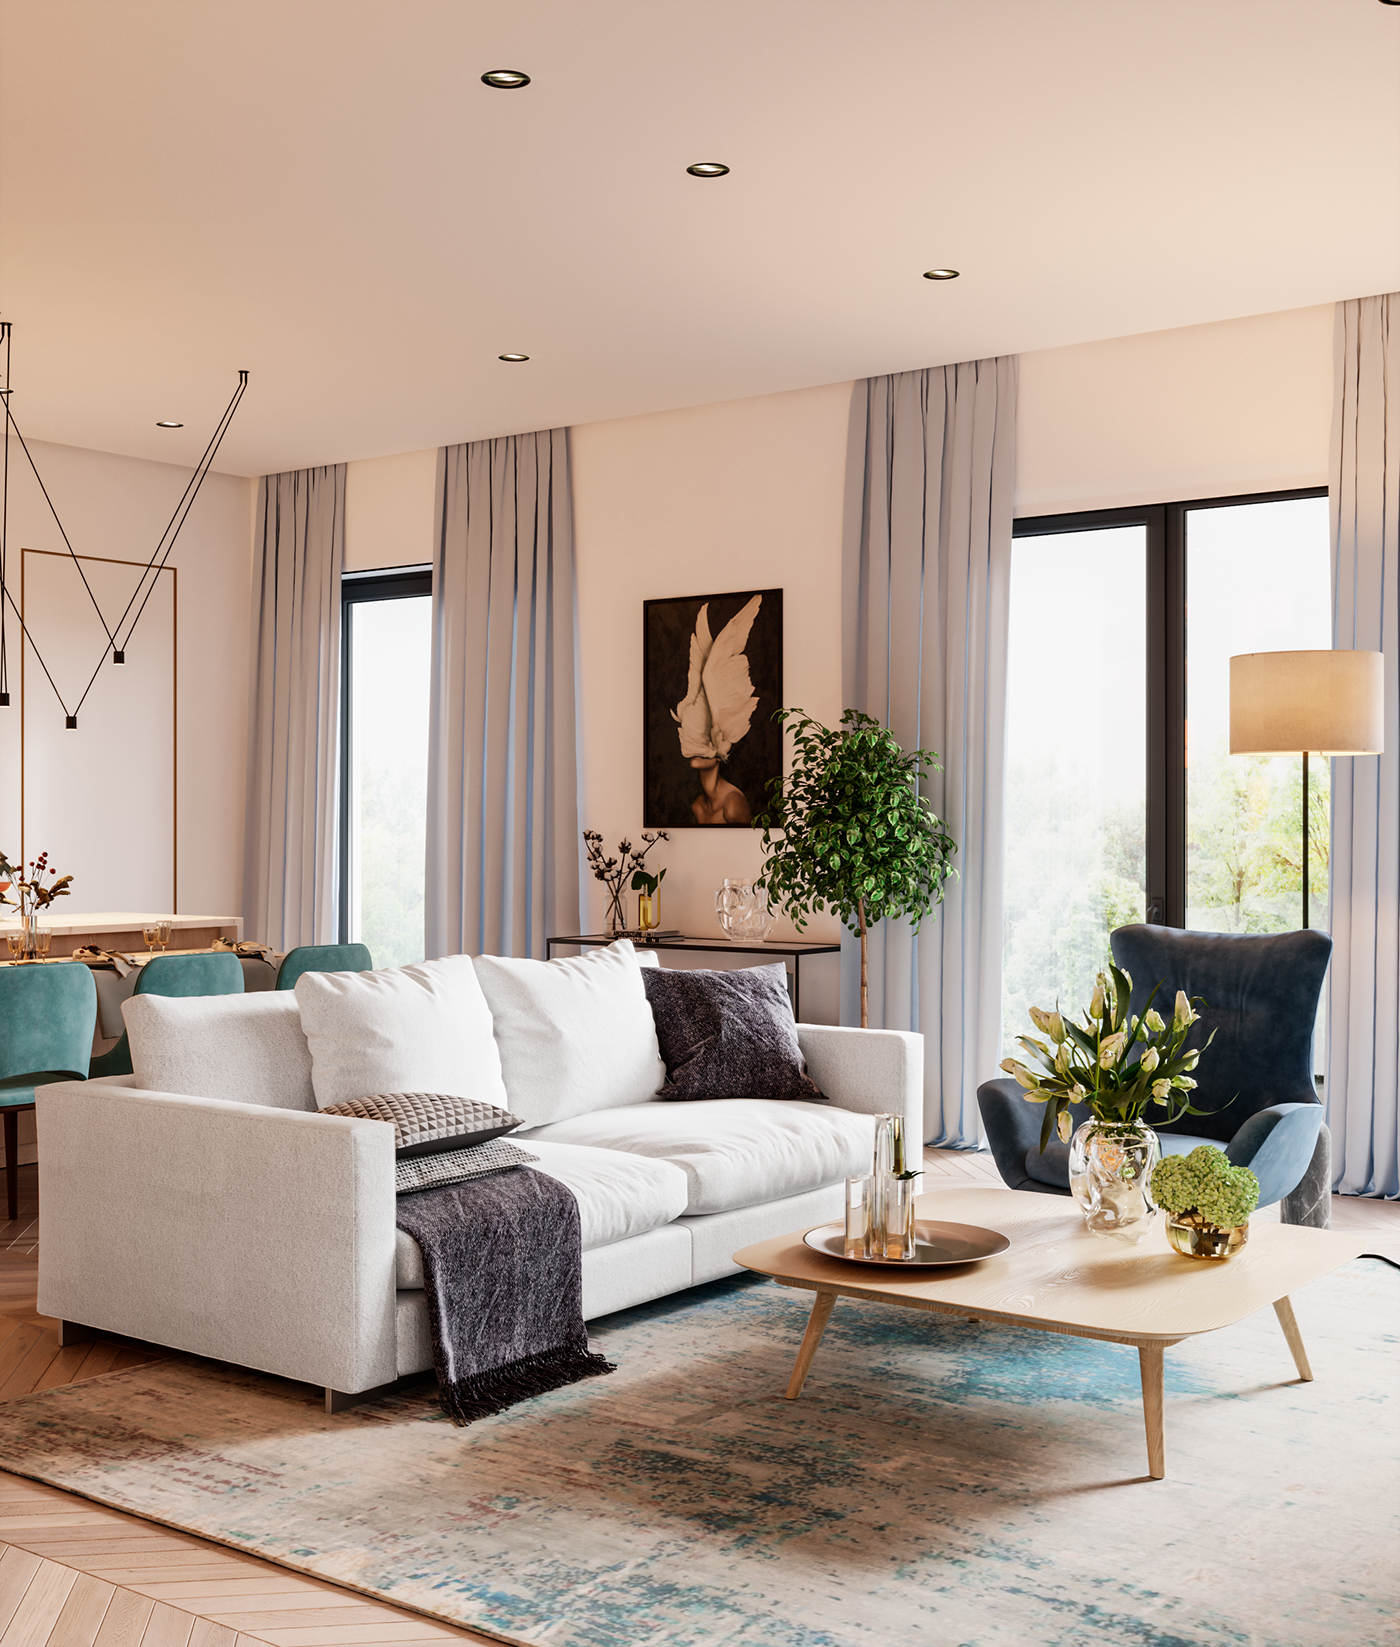 Rublevo 3 On Behance Living Room Decor Modern Home Decor Styles Contemporary Furniture Design